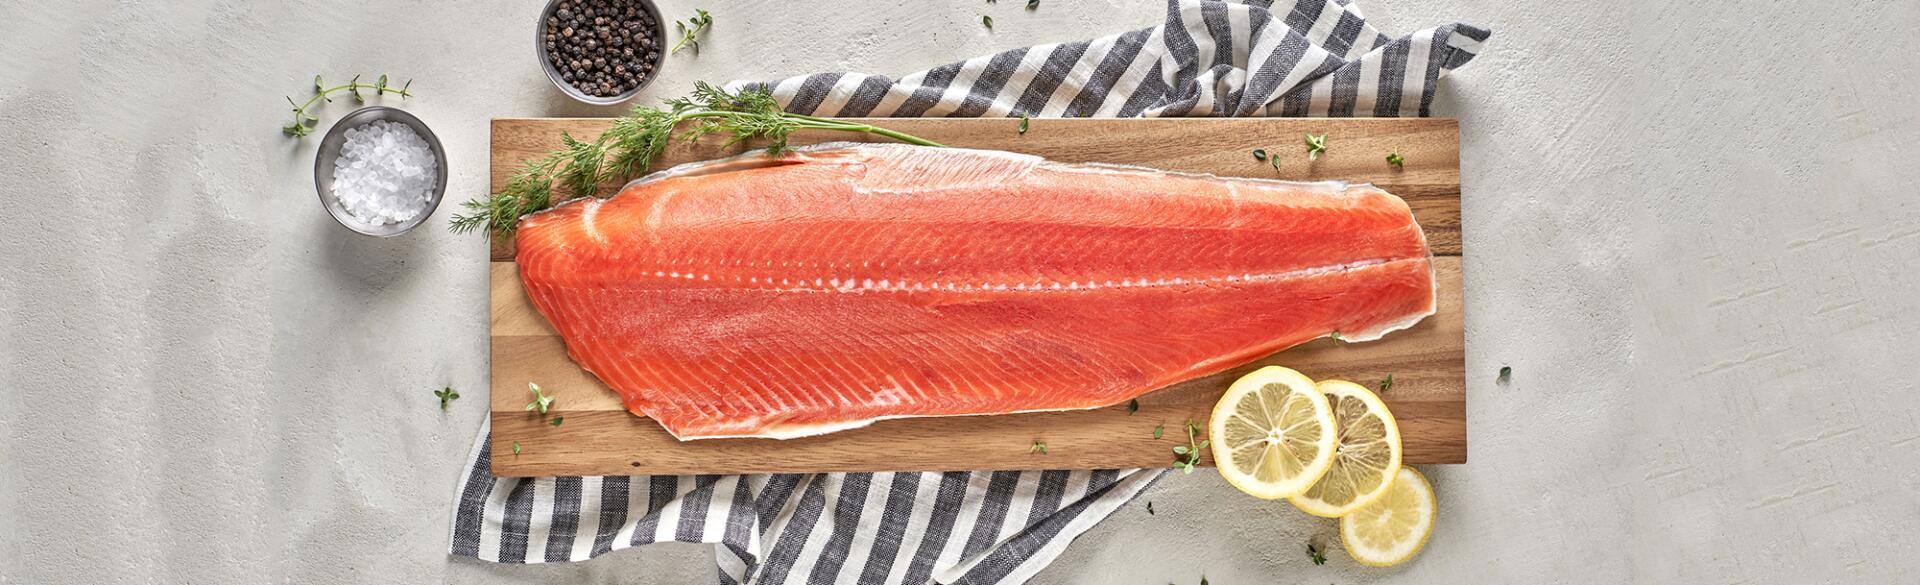 salmon filet on wooden slab shown for brain food